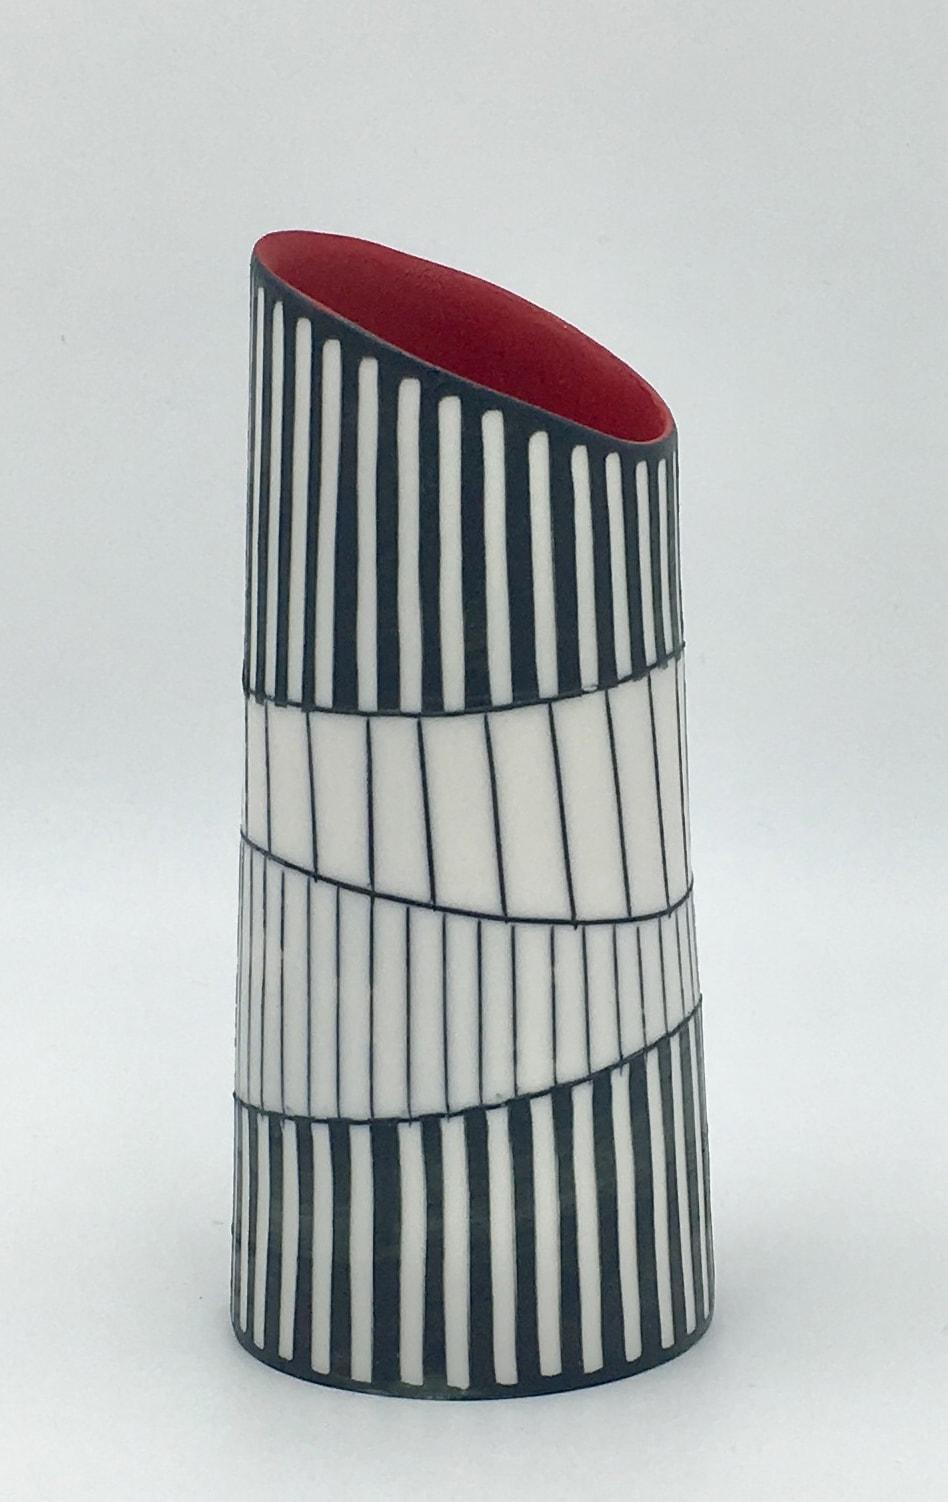 "<span class=""link fancybox-details-link""><a href=""/artists/195-lara-scobie/works/6530-lara-scobie-vase-with-tilted-rim-2019/"">View Detail Page</a></span><div class=""artist""><strong>Lara Scobie</strong></div> b. 1967 <div class=""title""><em>Vase with Tilted Rim</em>, 2019</div> <div class=""medium"">Porcelain</div>"